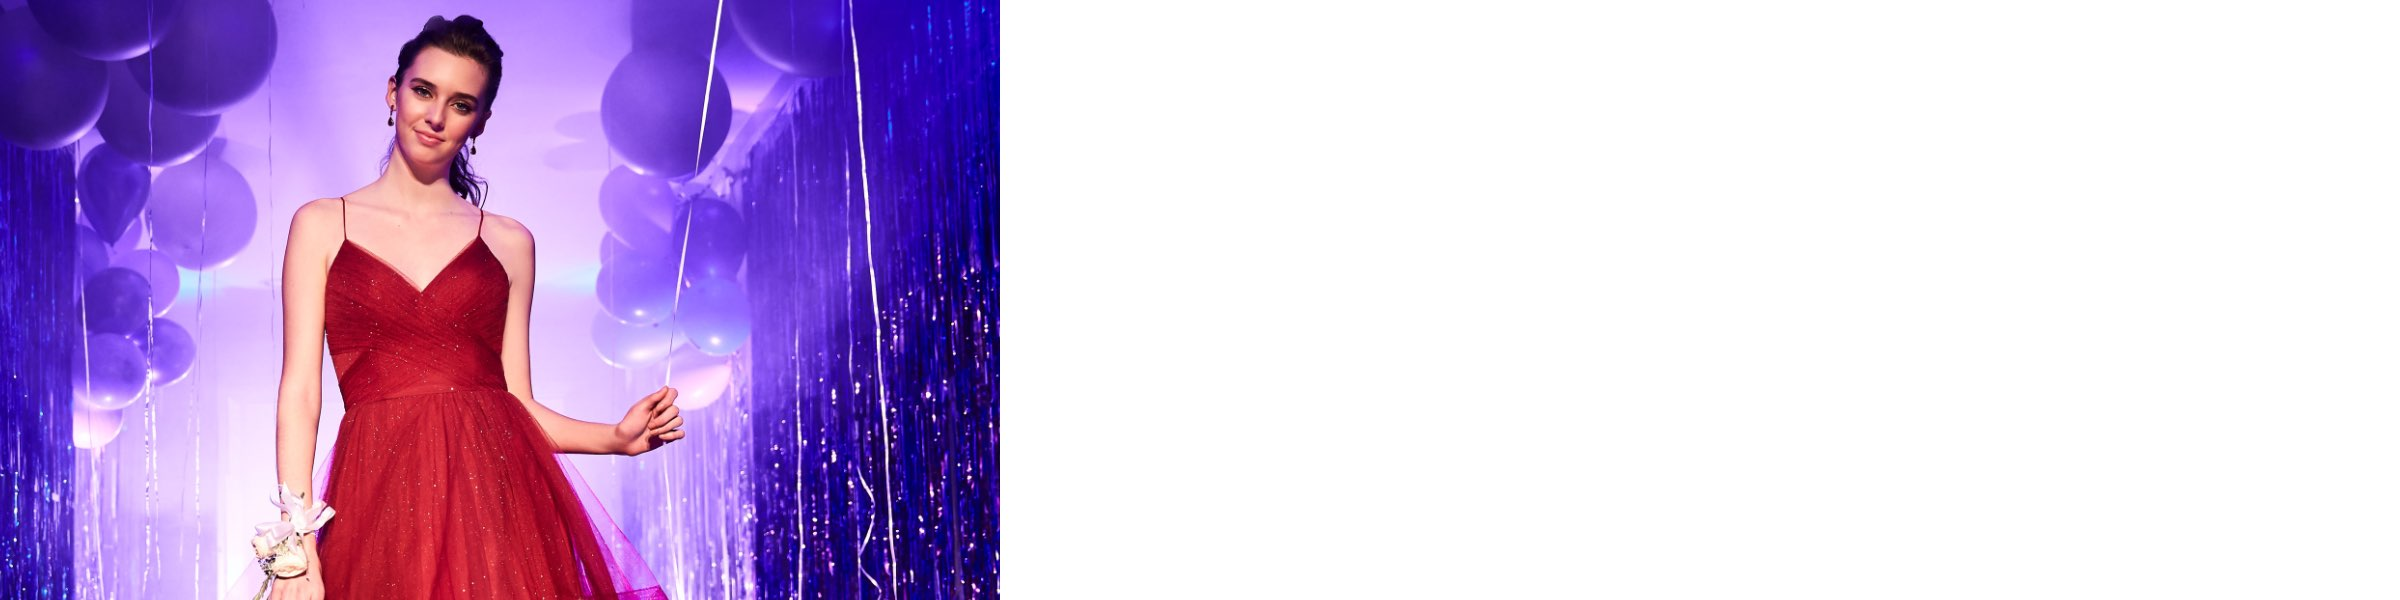 Melanie Lyne - Robes de bal